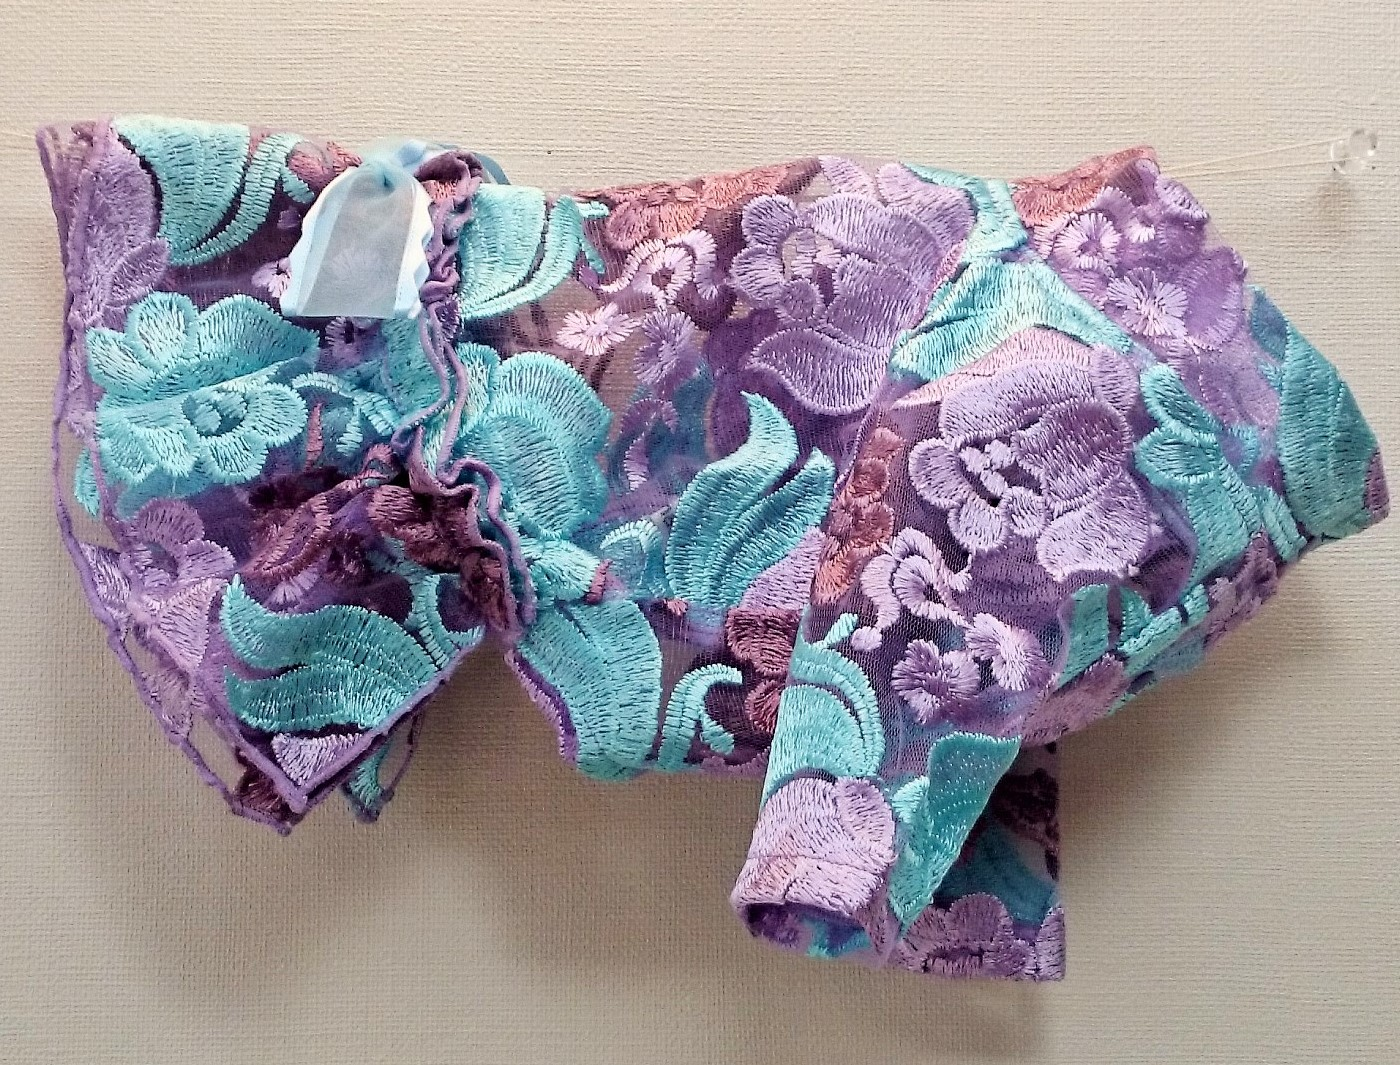 Remanis ドレス 紫 ③ (2)